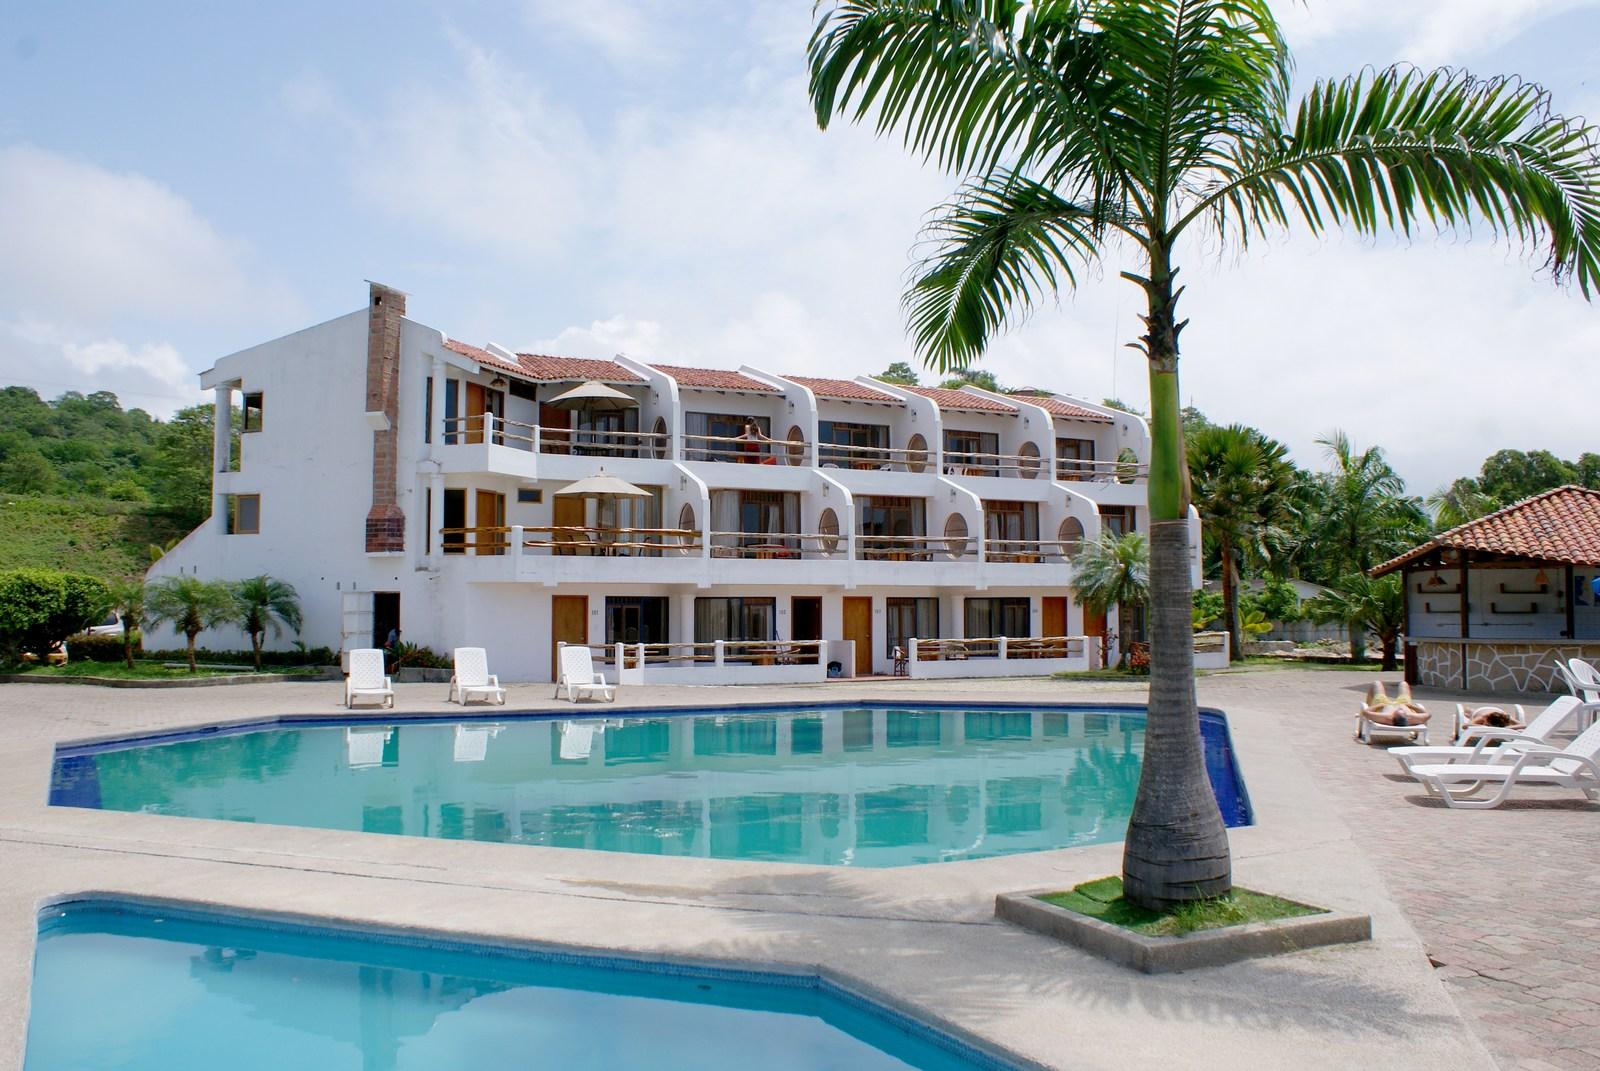 Piscina-_Hotel_Baja_Montañita